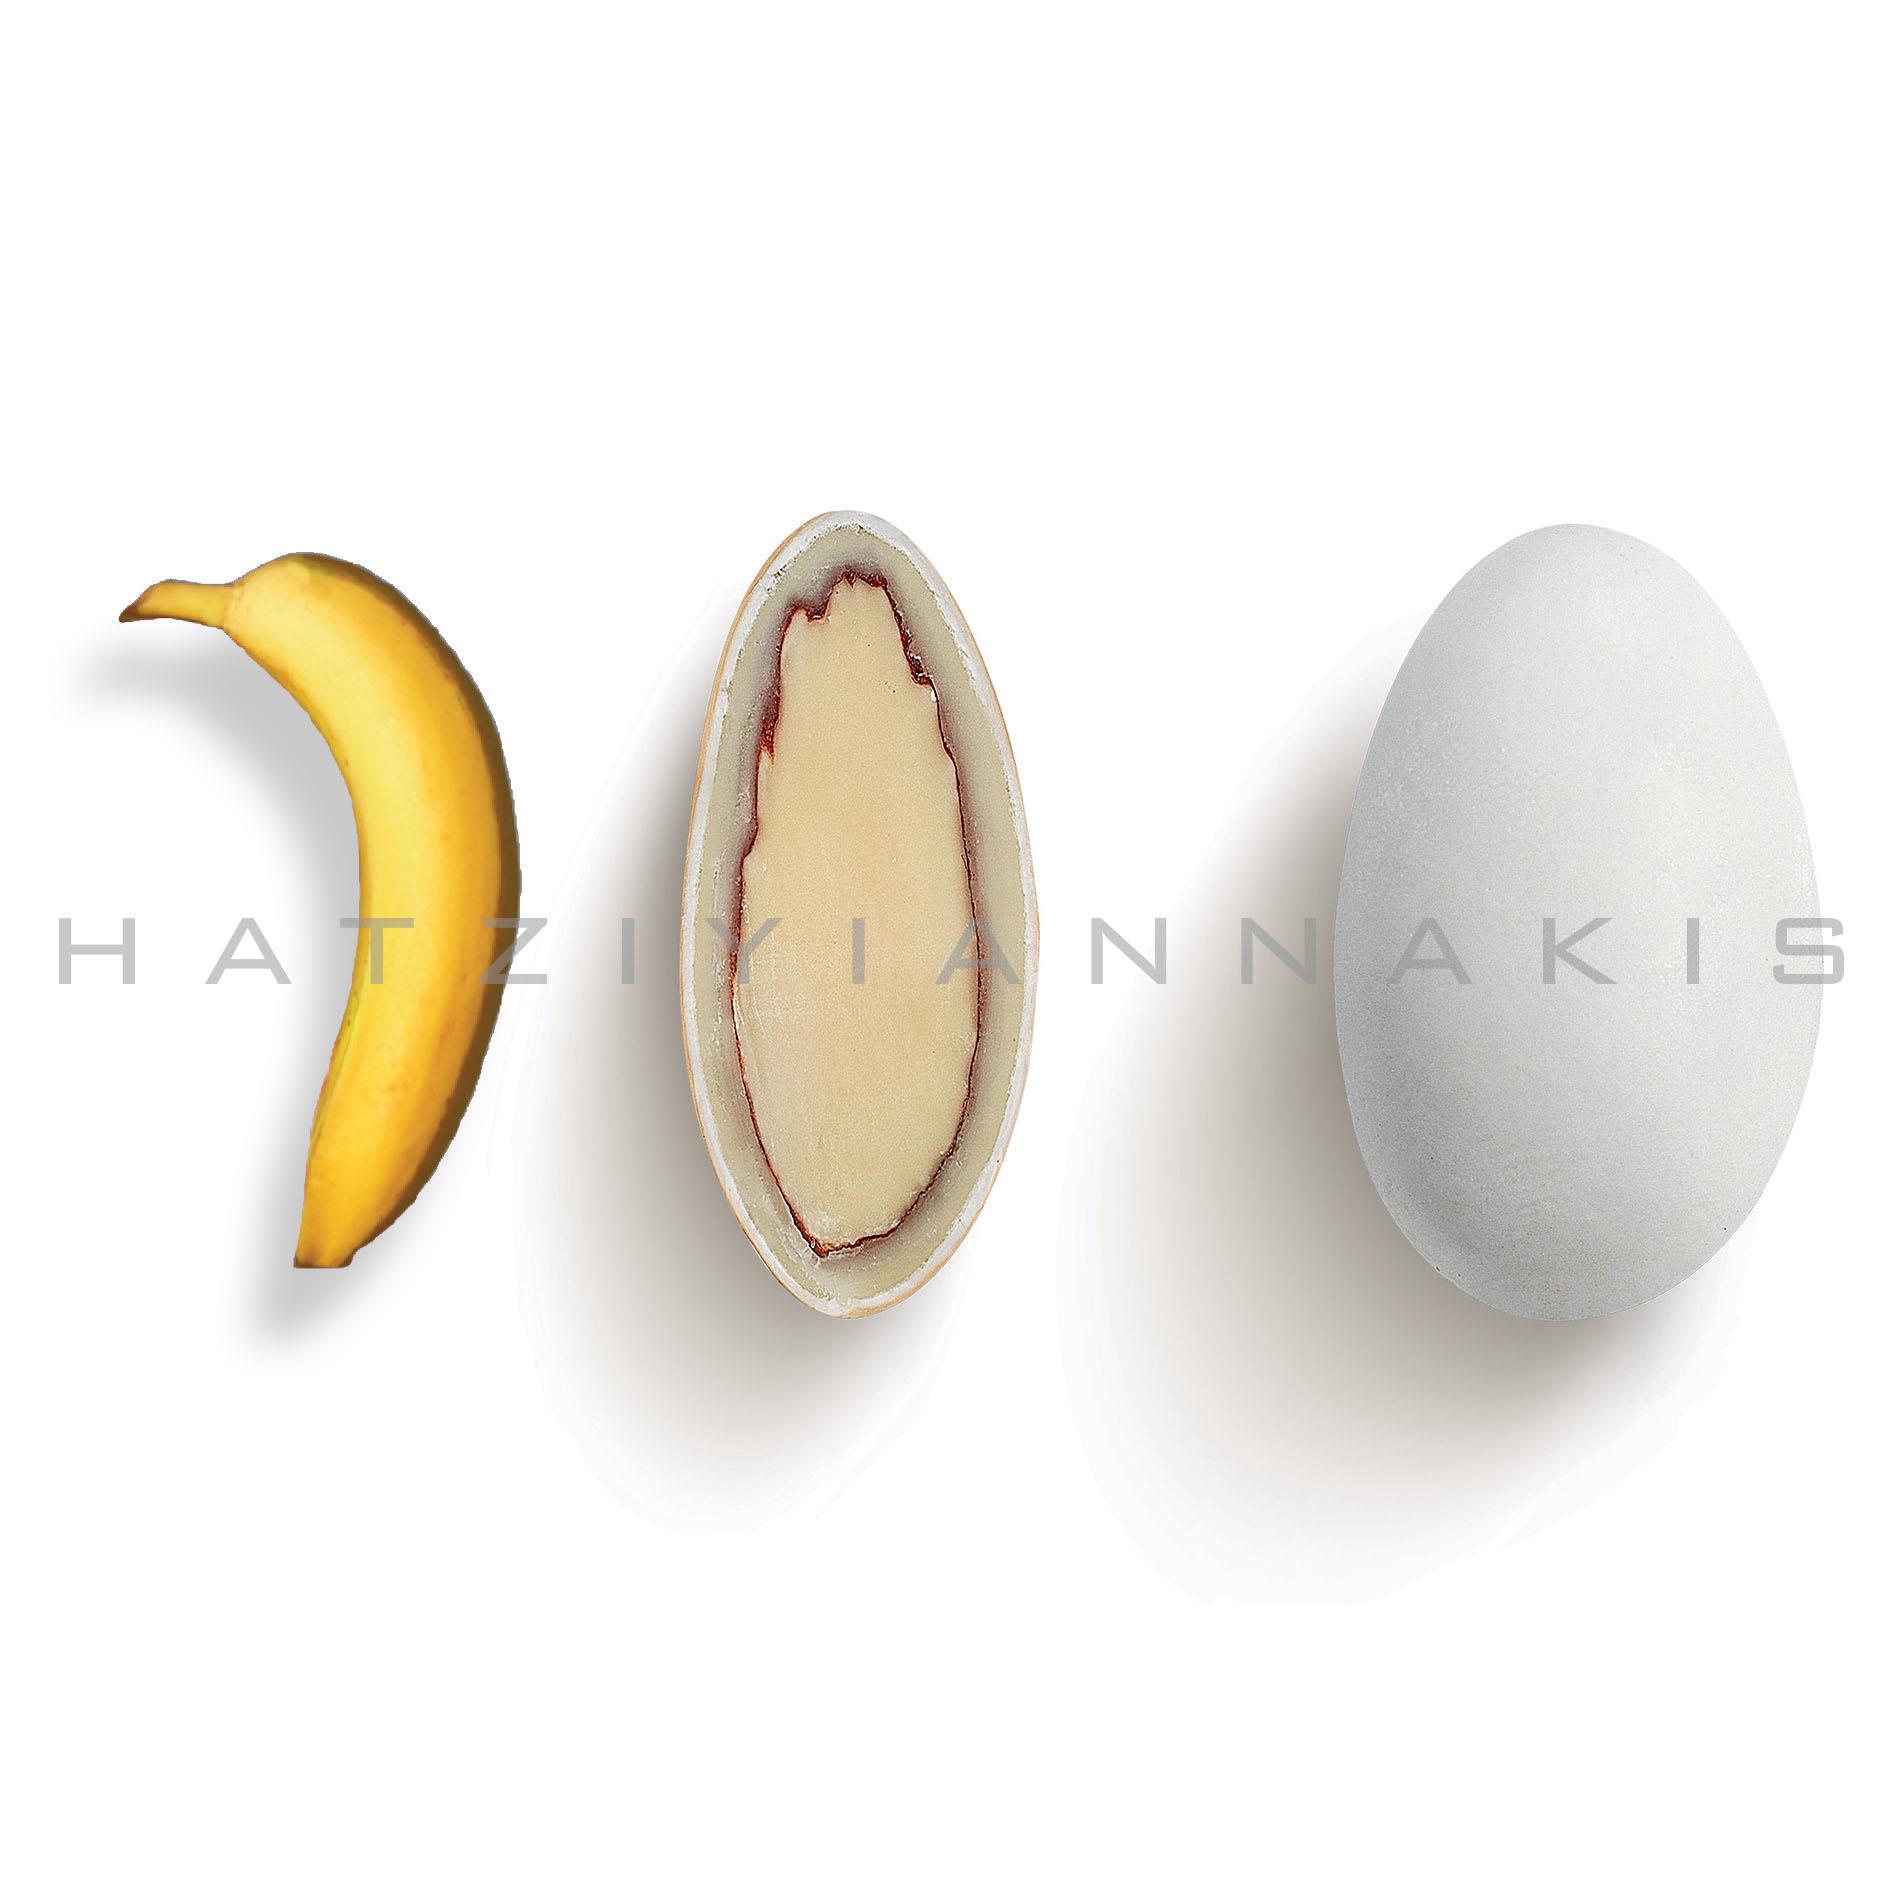 Choco Almond γεύση Μπανάνα κουφέτο λευκό ματ